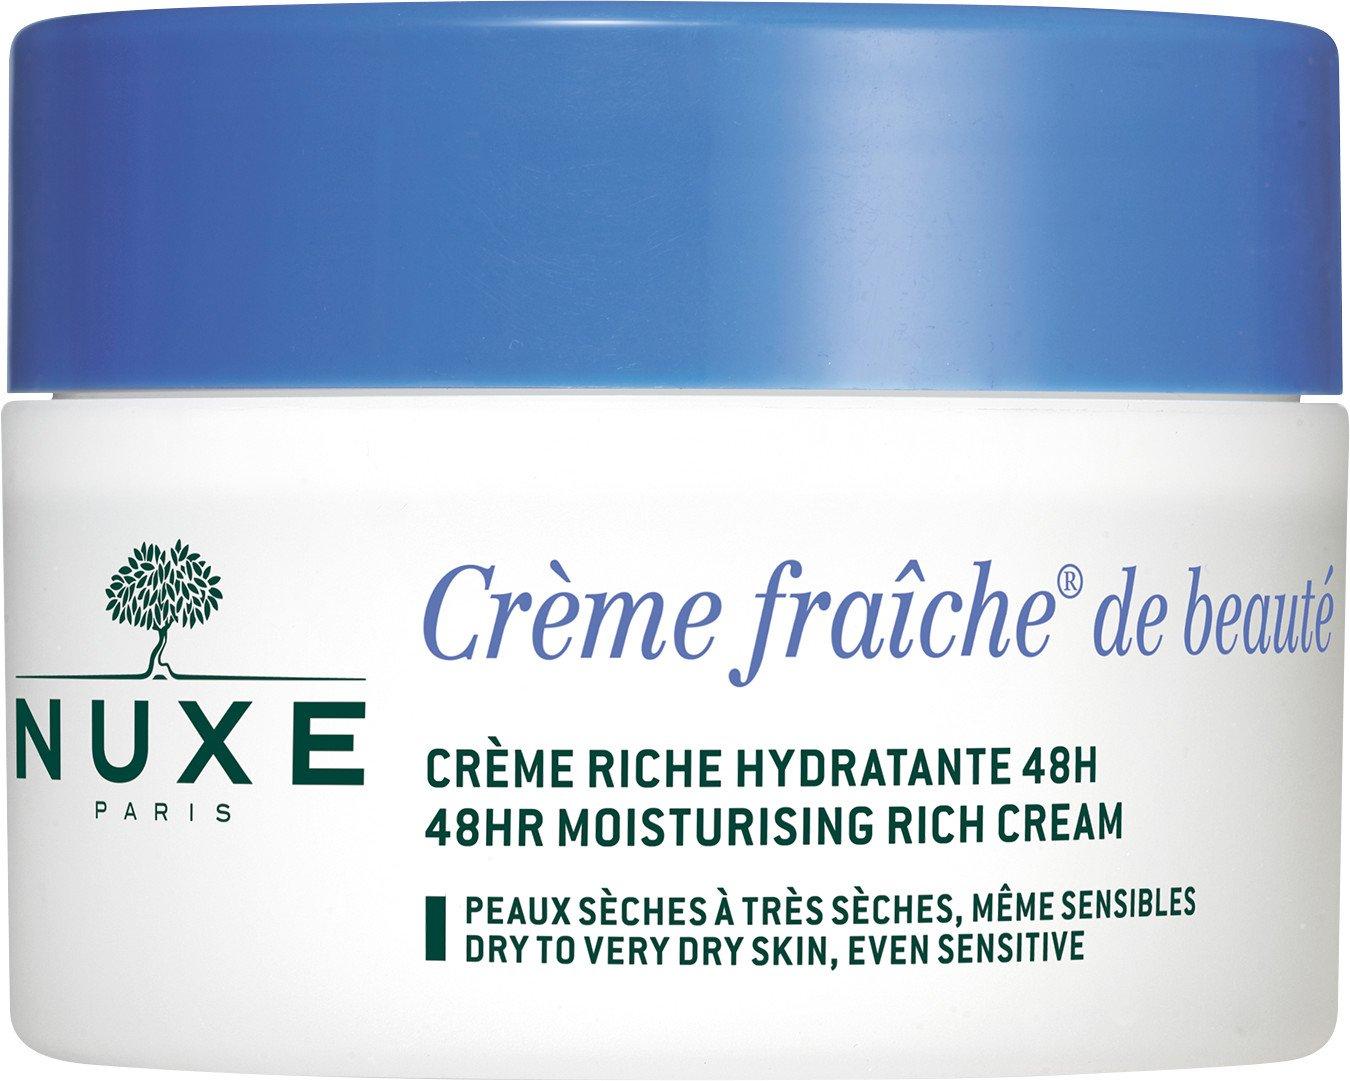 NUXE Creme Fraiche De Beaute 48hr Moisturising Rich Cream - Dry to Very Dry Skin 50ml NU2310